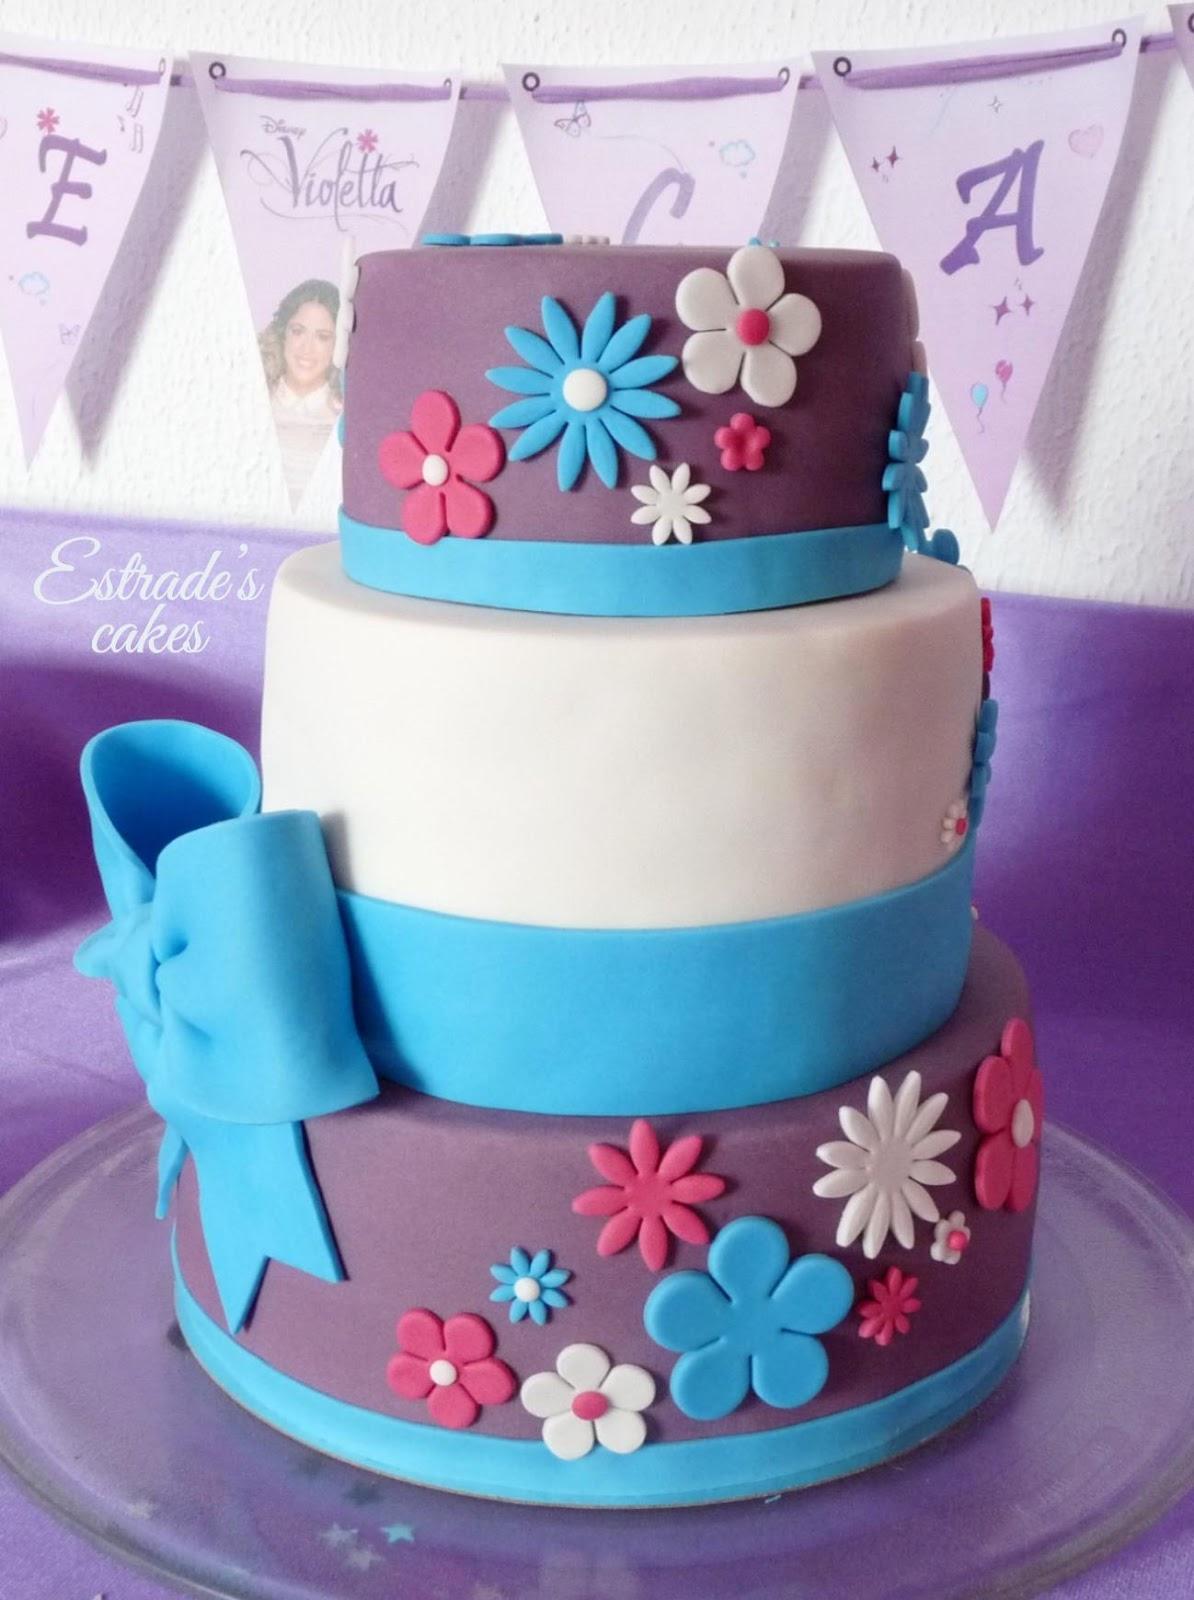 tarta de Violetta para cumpleaños - 4